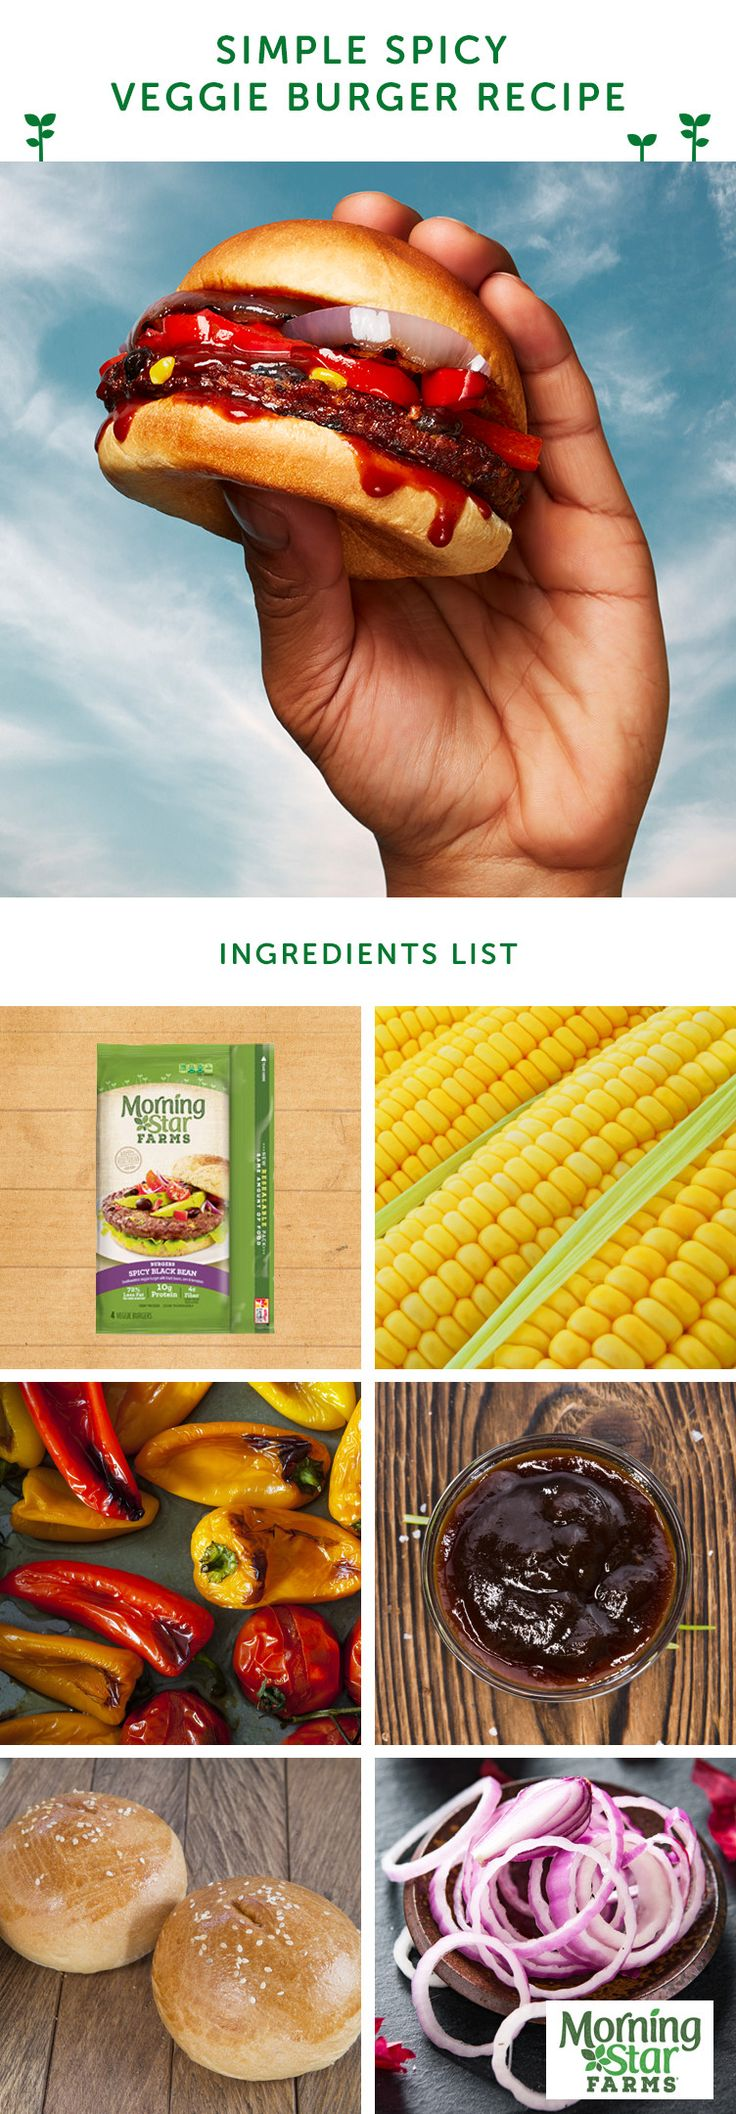 14 Best Summer Bbq Images On Pinterest Vegetarian Recipes Burger